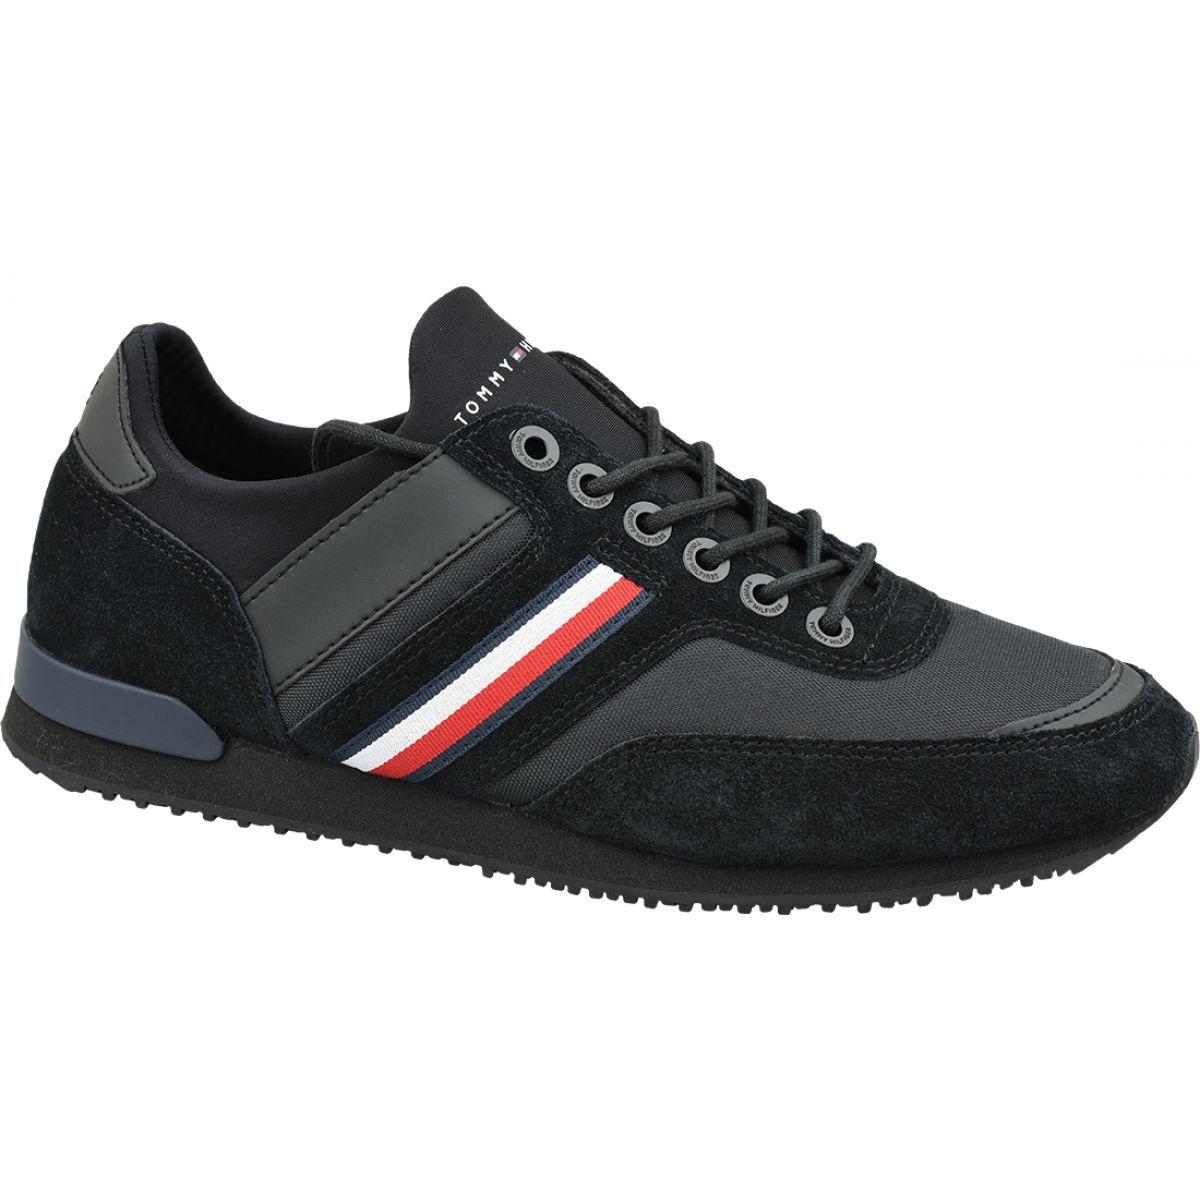 Buty Tommy Hilfiger Iconic Sock Runner M Fm0fm02409 990 Czarne Iconic Socks Tommy Hilfiger Hilfiger